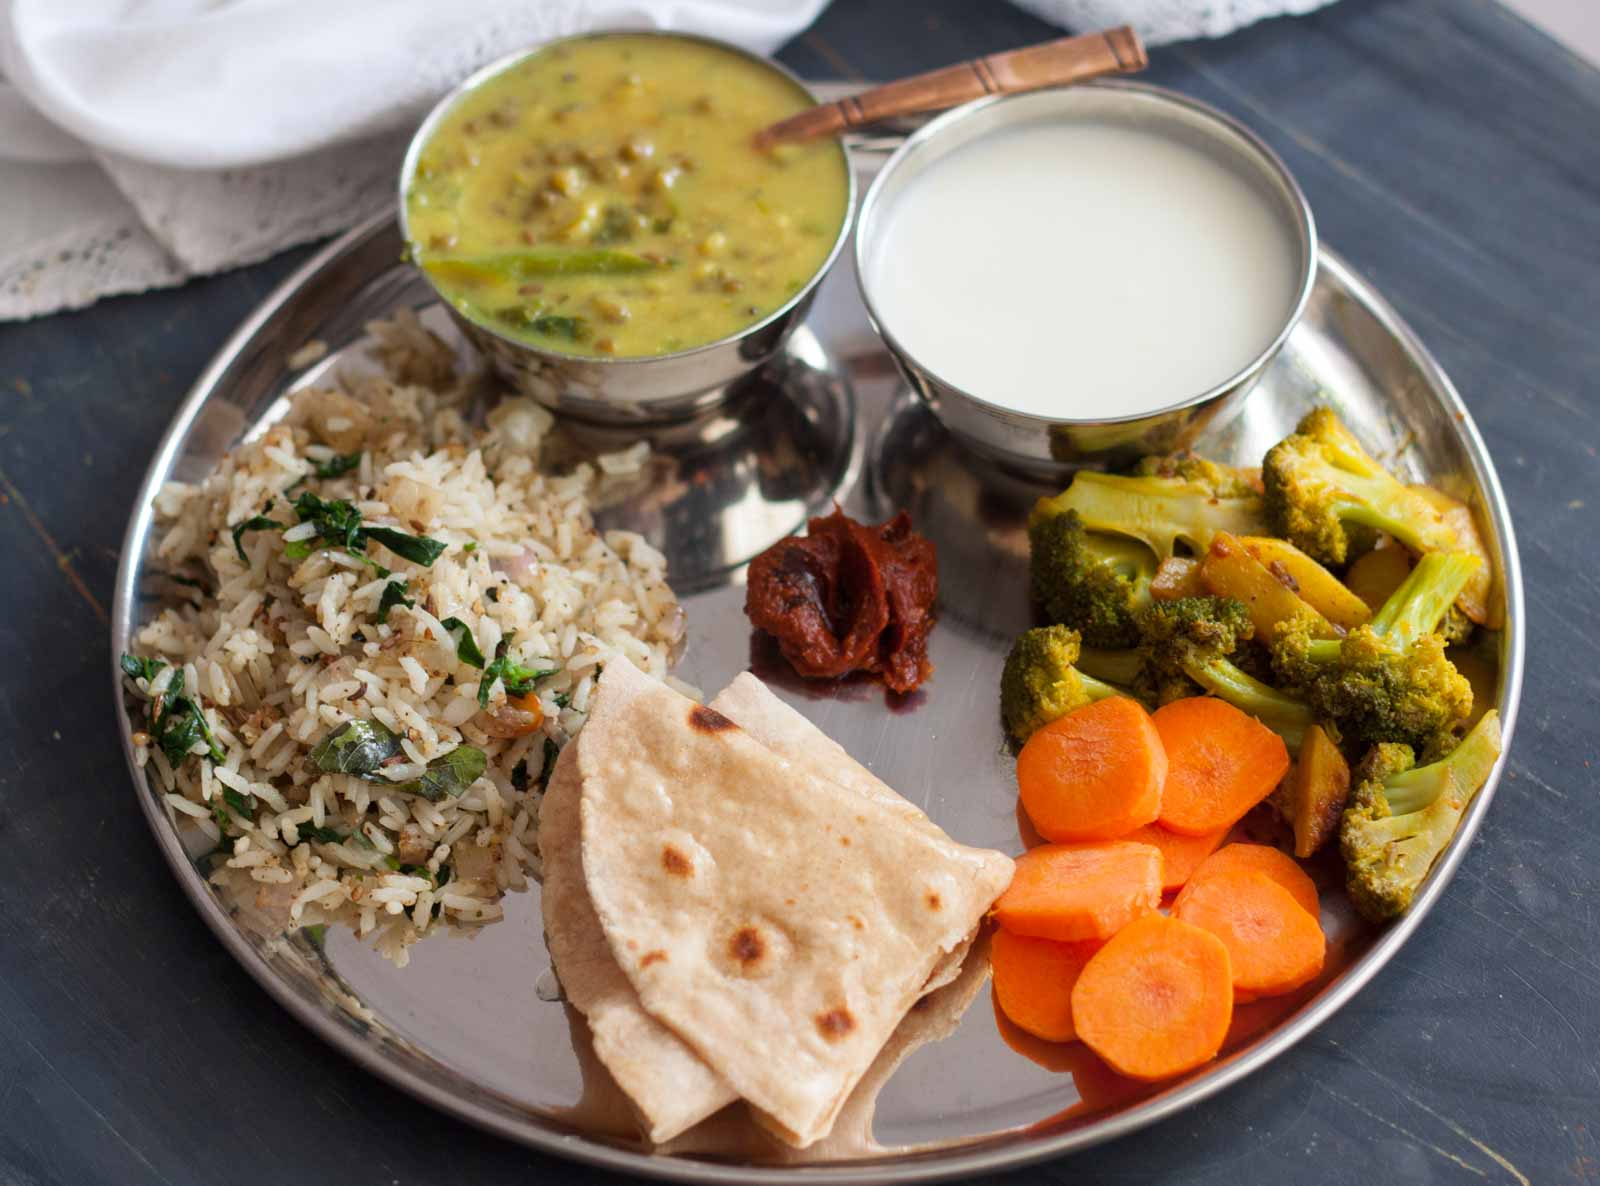 'Rice plate as important as a peg': Shiv Sena takes a dig at Raj Thackeray